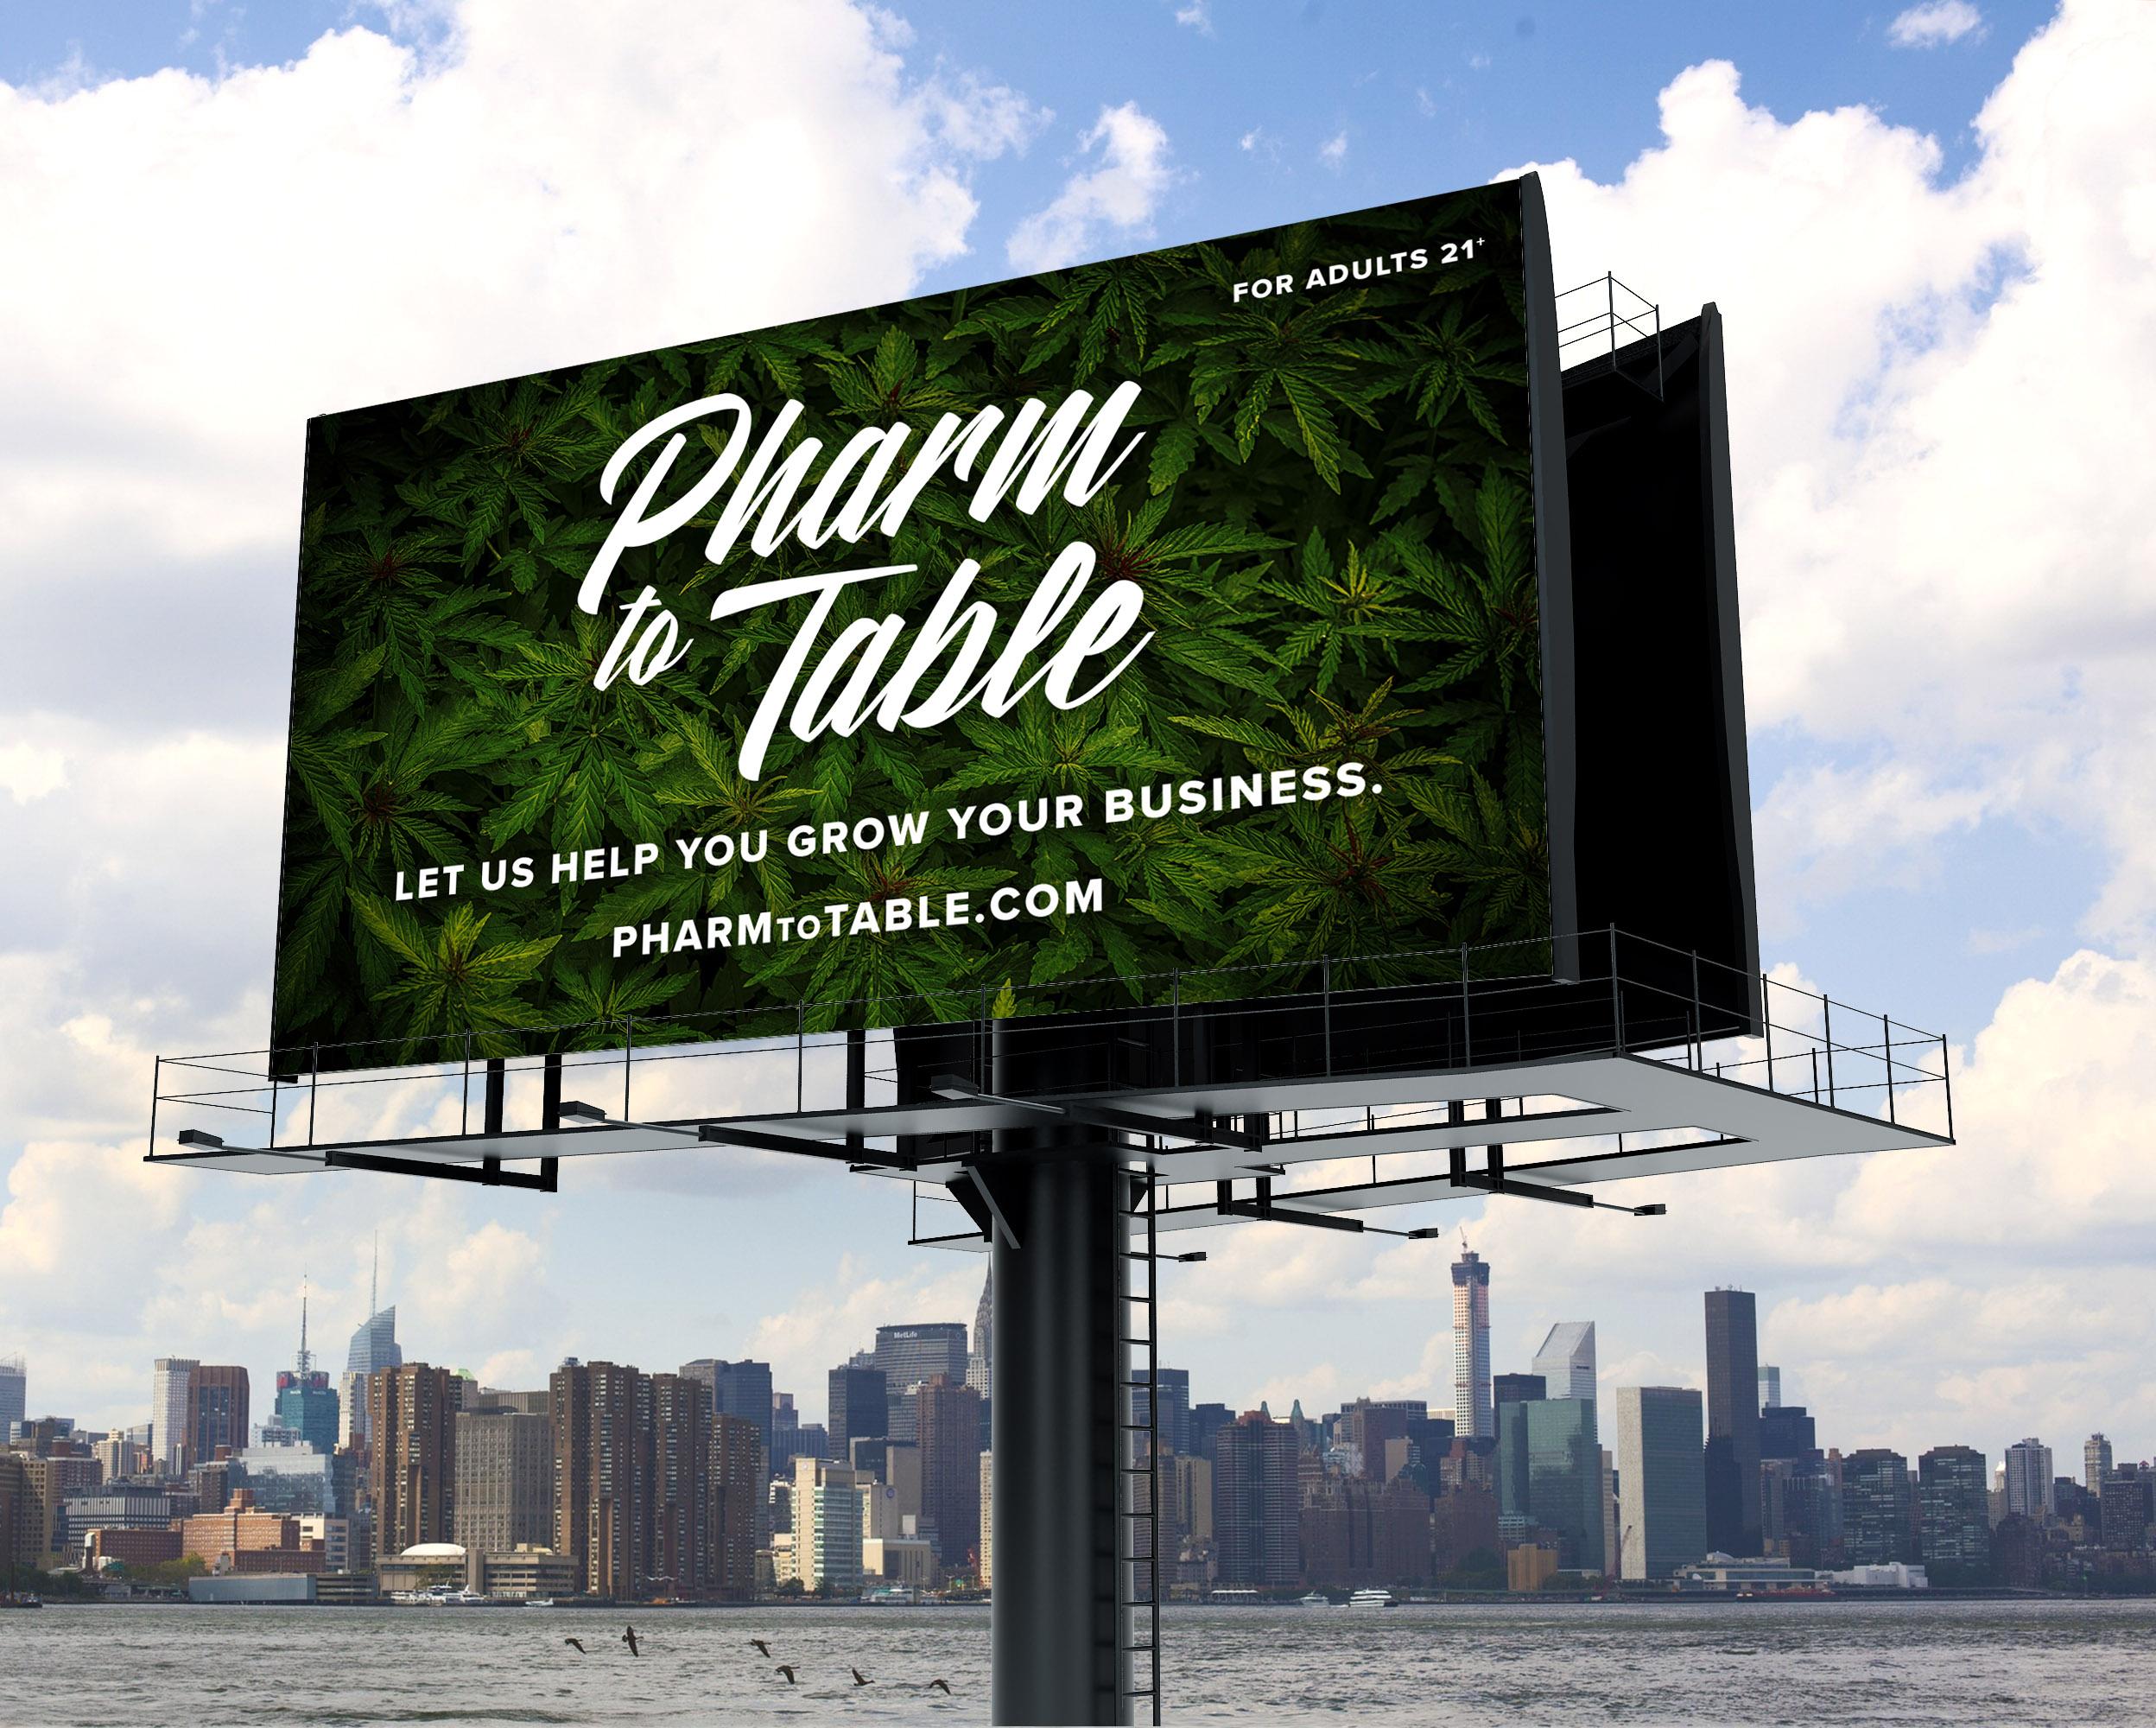 PharmToTable_Billboard.jpg